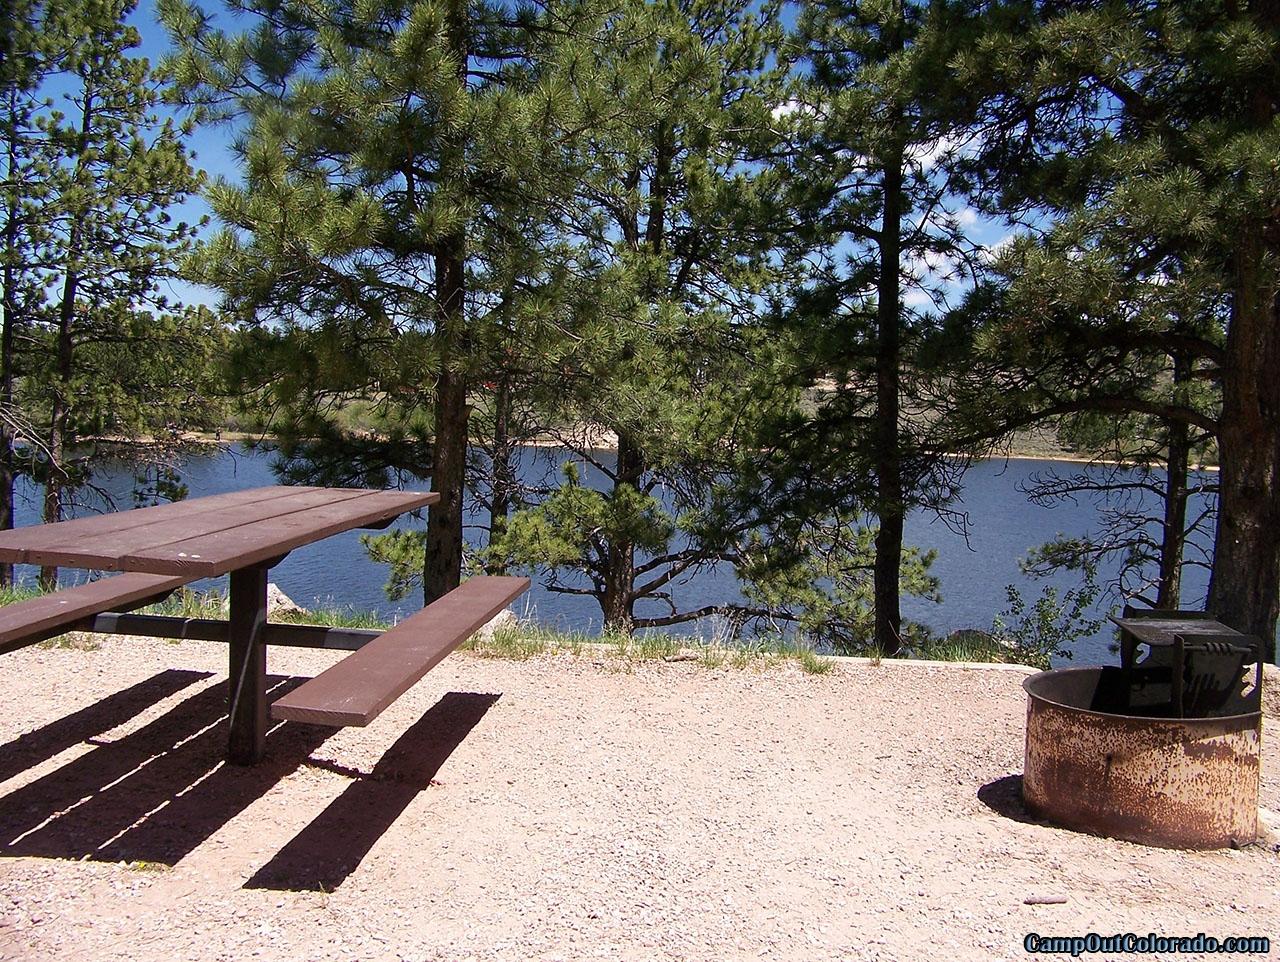 campoutcolorado-west-lake-tight-camp-site